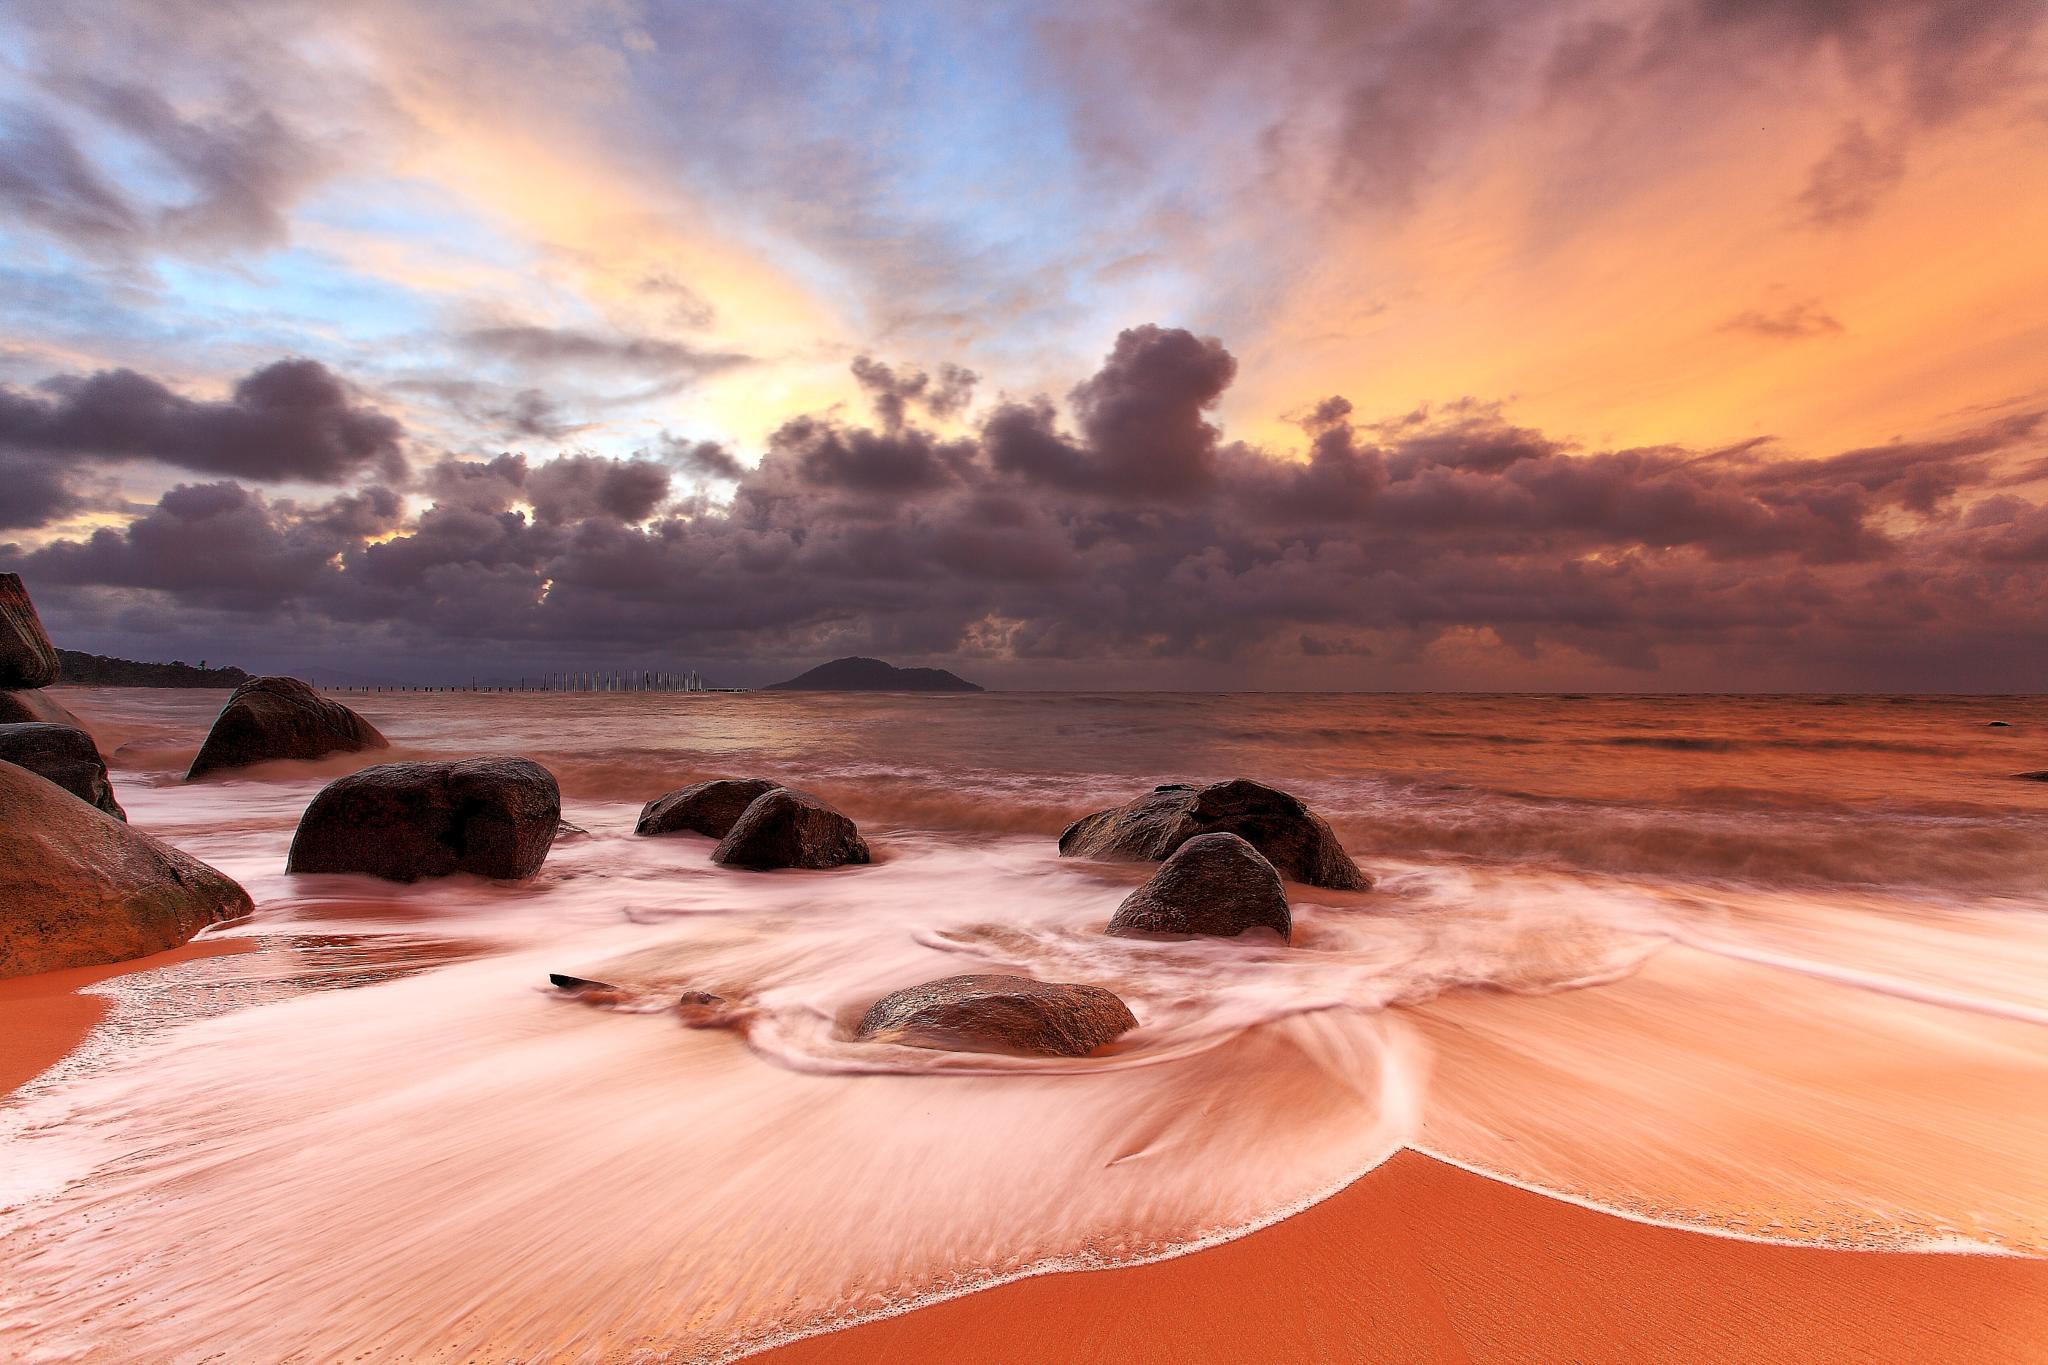 Another Sunset at Samudra Indah Beach Singkawang by liongcewong